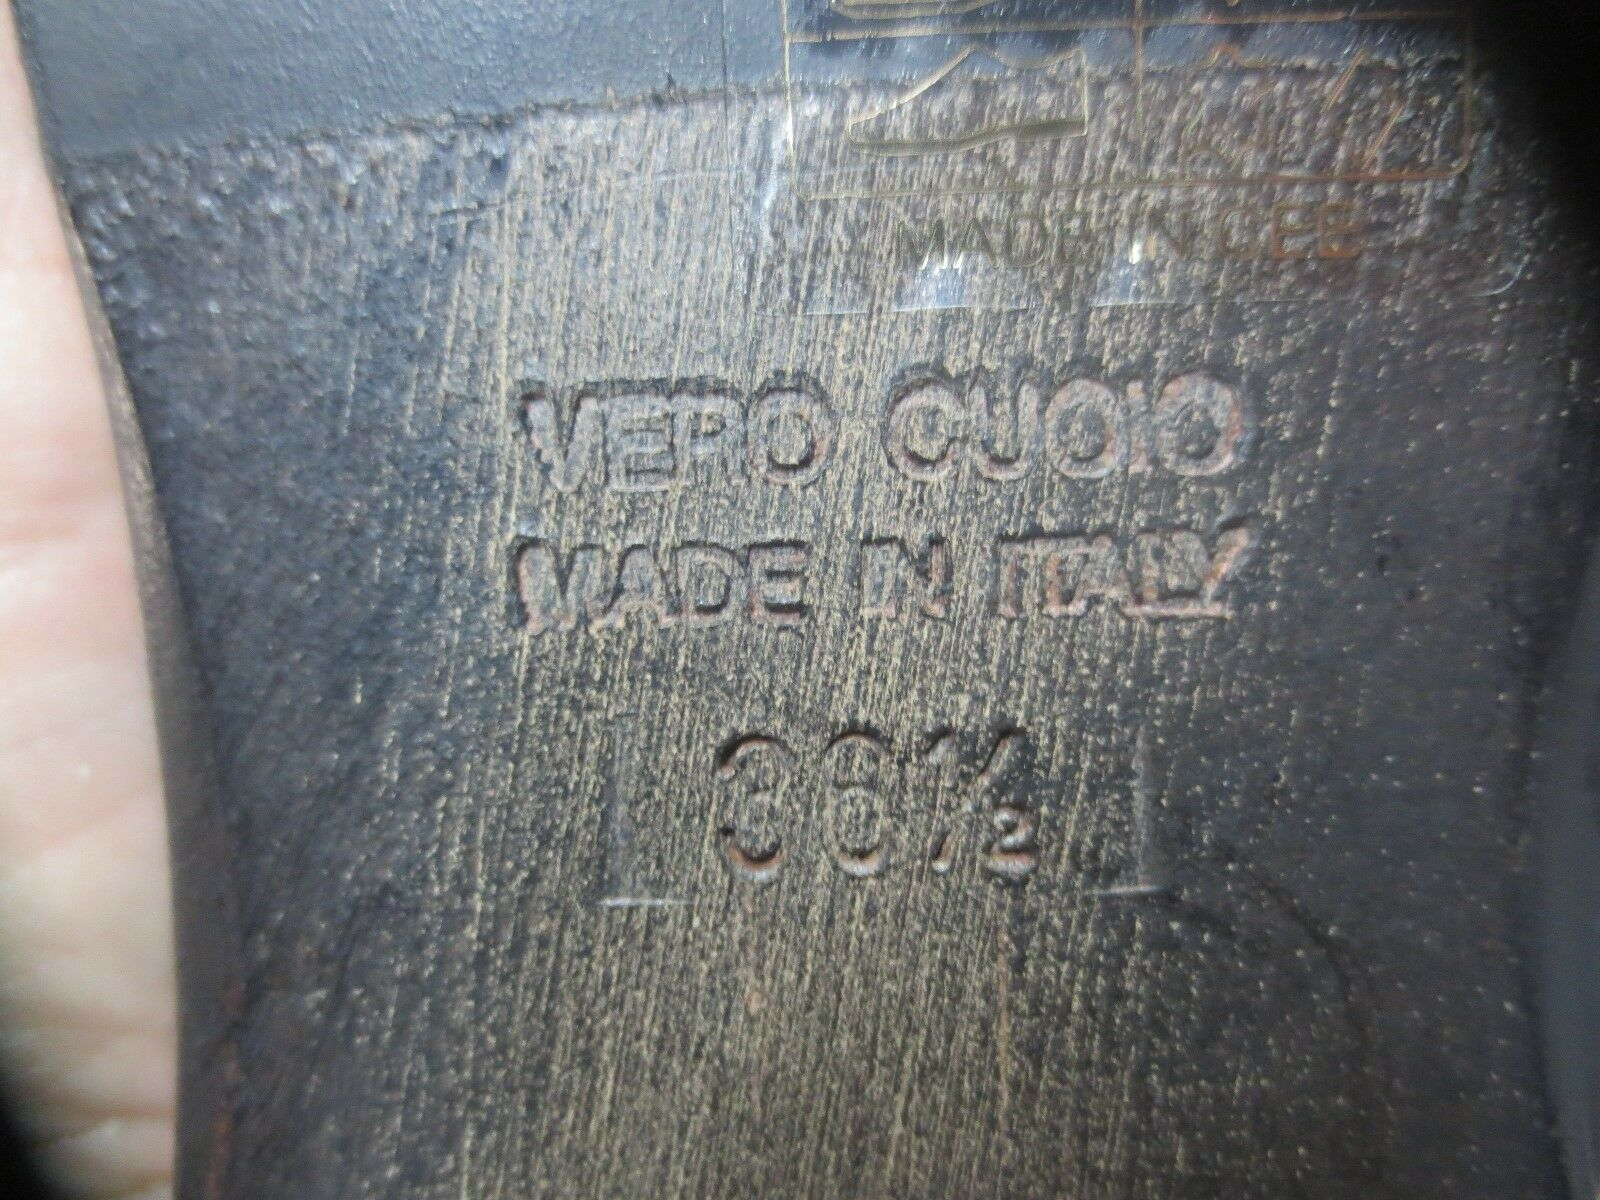 NOW Stiefel oder Kniestiefel Wert 340E schwarzes Leder Leder Leder Schuhgrößen 35.5,36,36.5, f6ff29